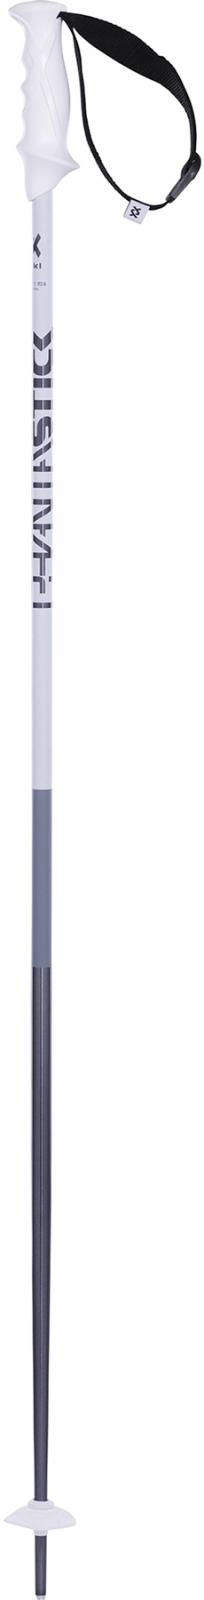 Völkl Phantastick 2 - biela